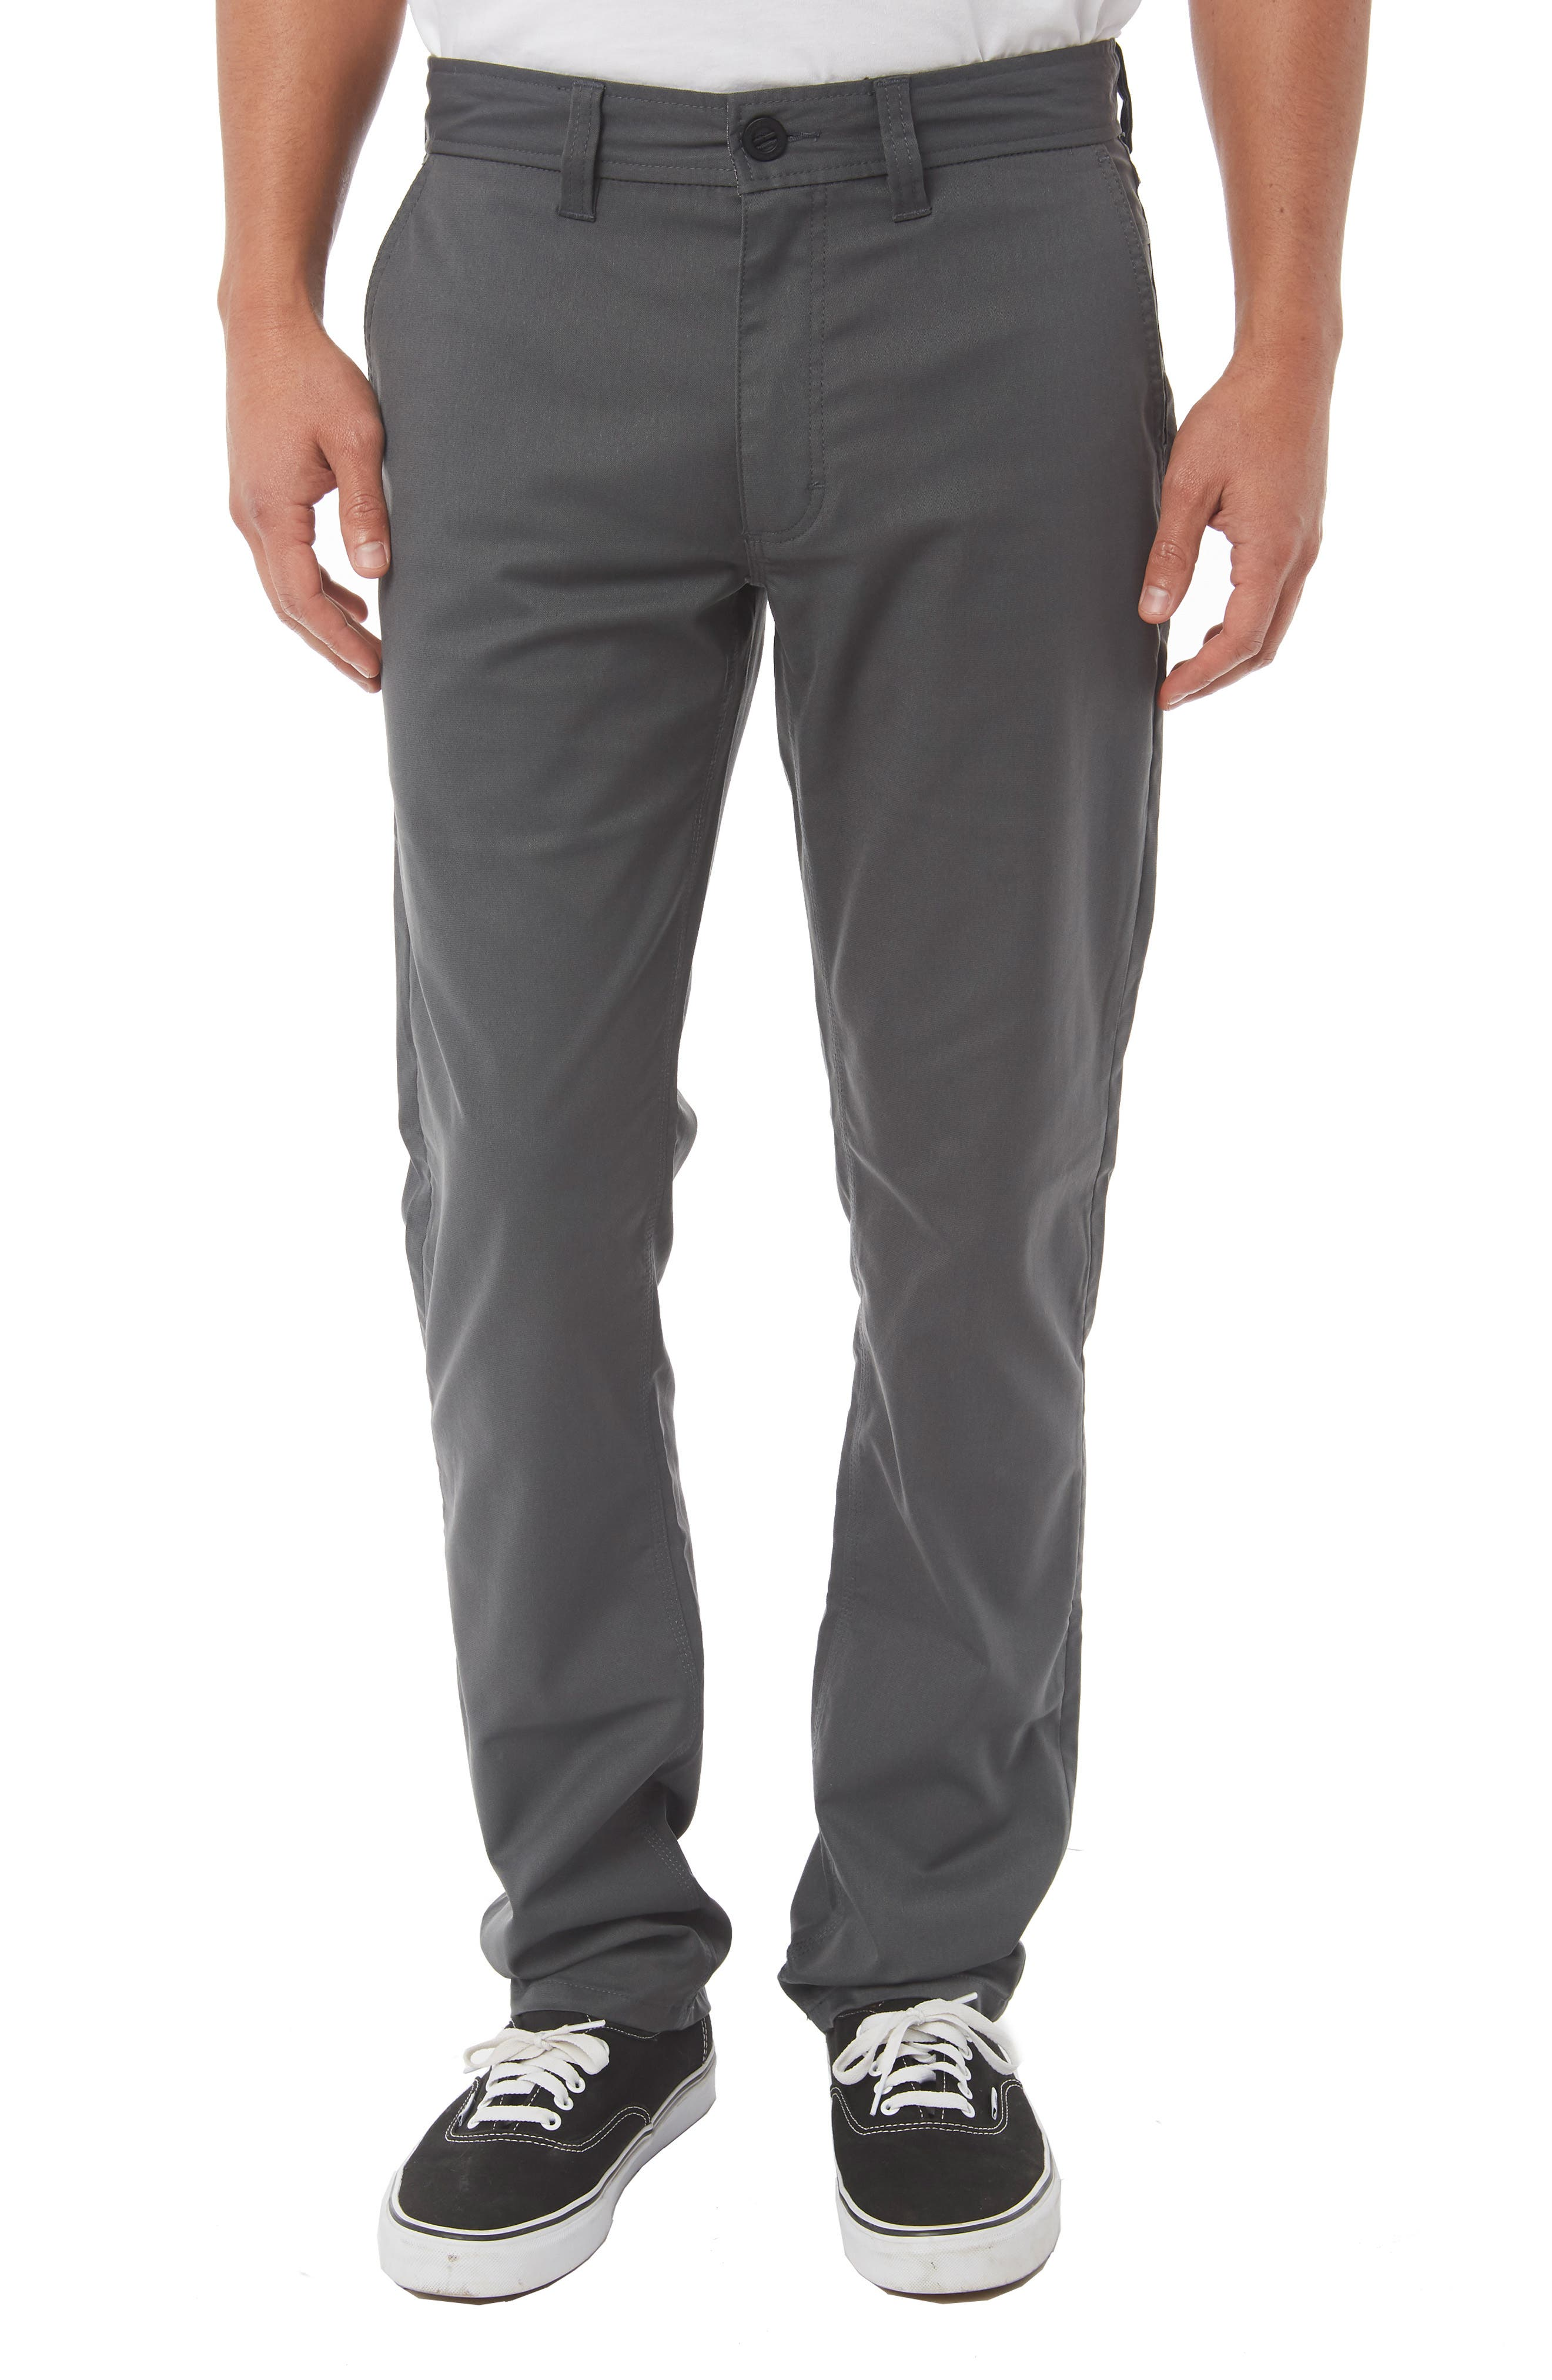 Redlands Hybrid Performance Pants,                         Main,                         color, DARK FATIGUE